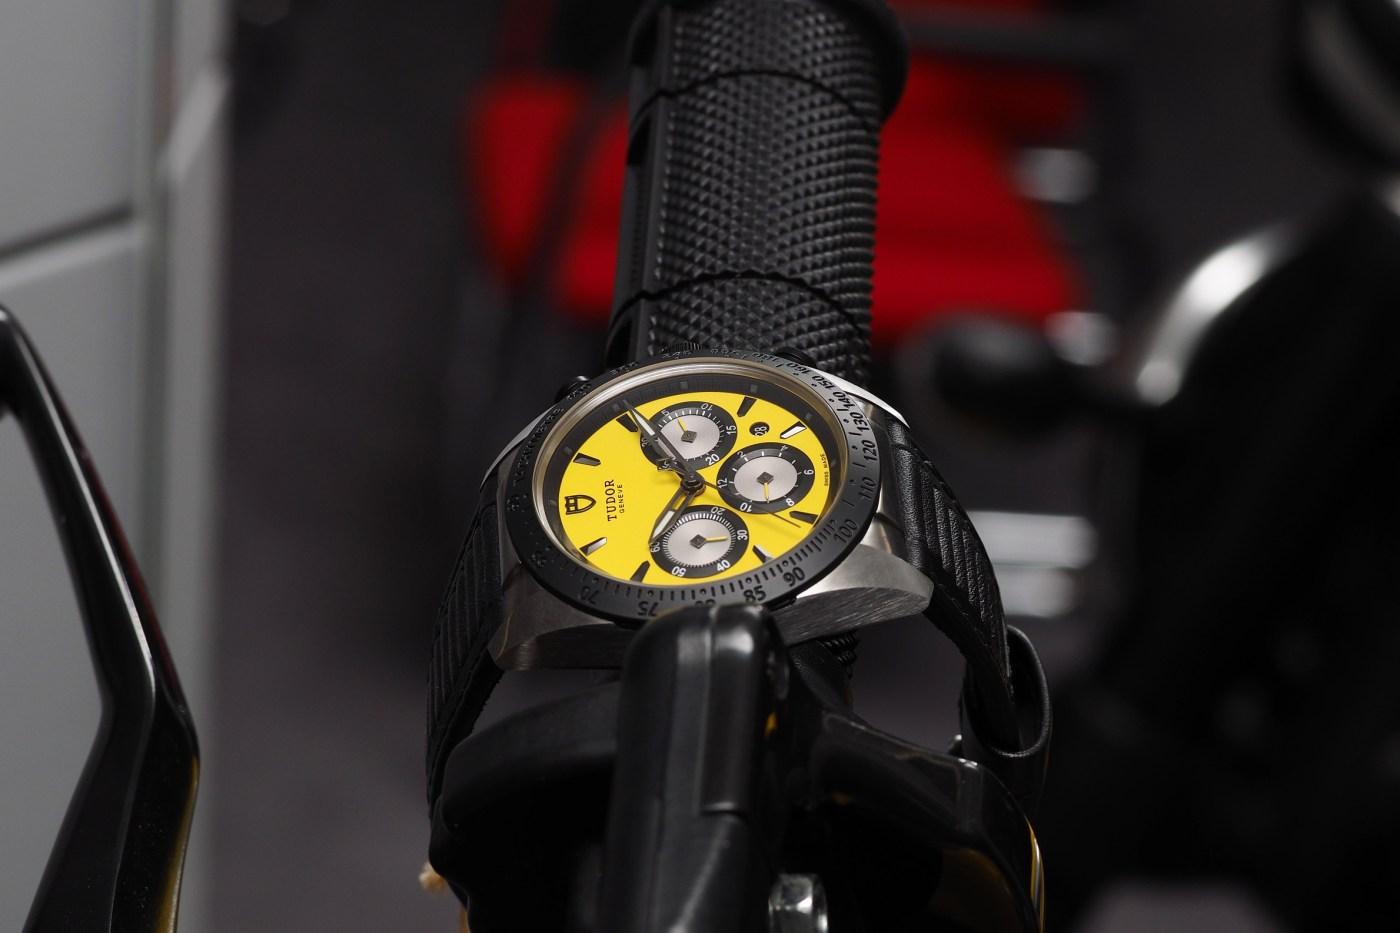 Tudor Ducati Fastrider Handlebars